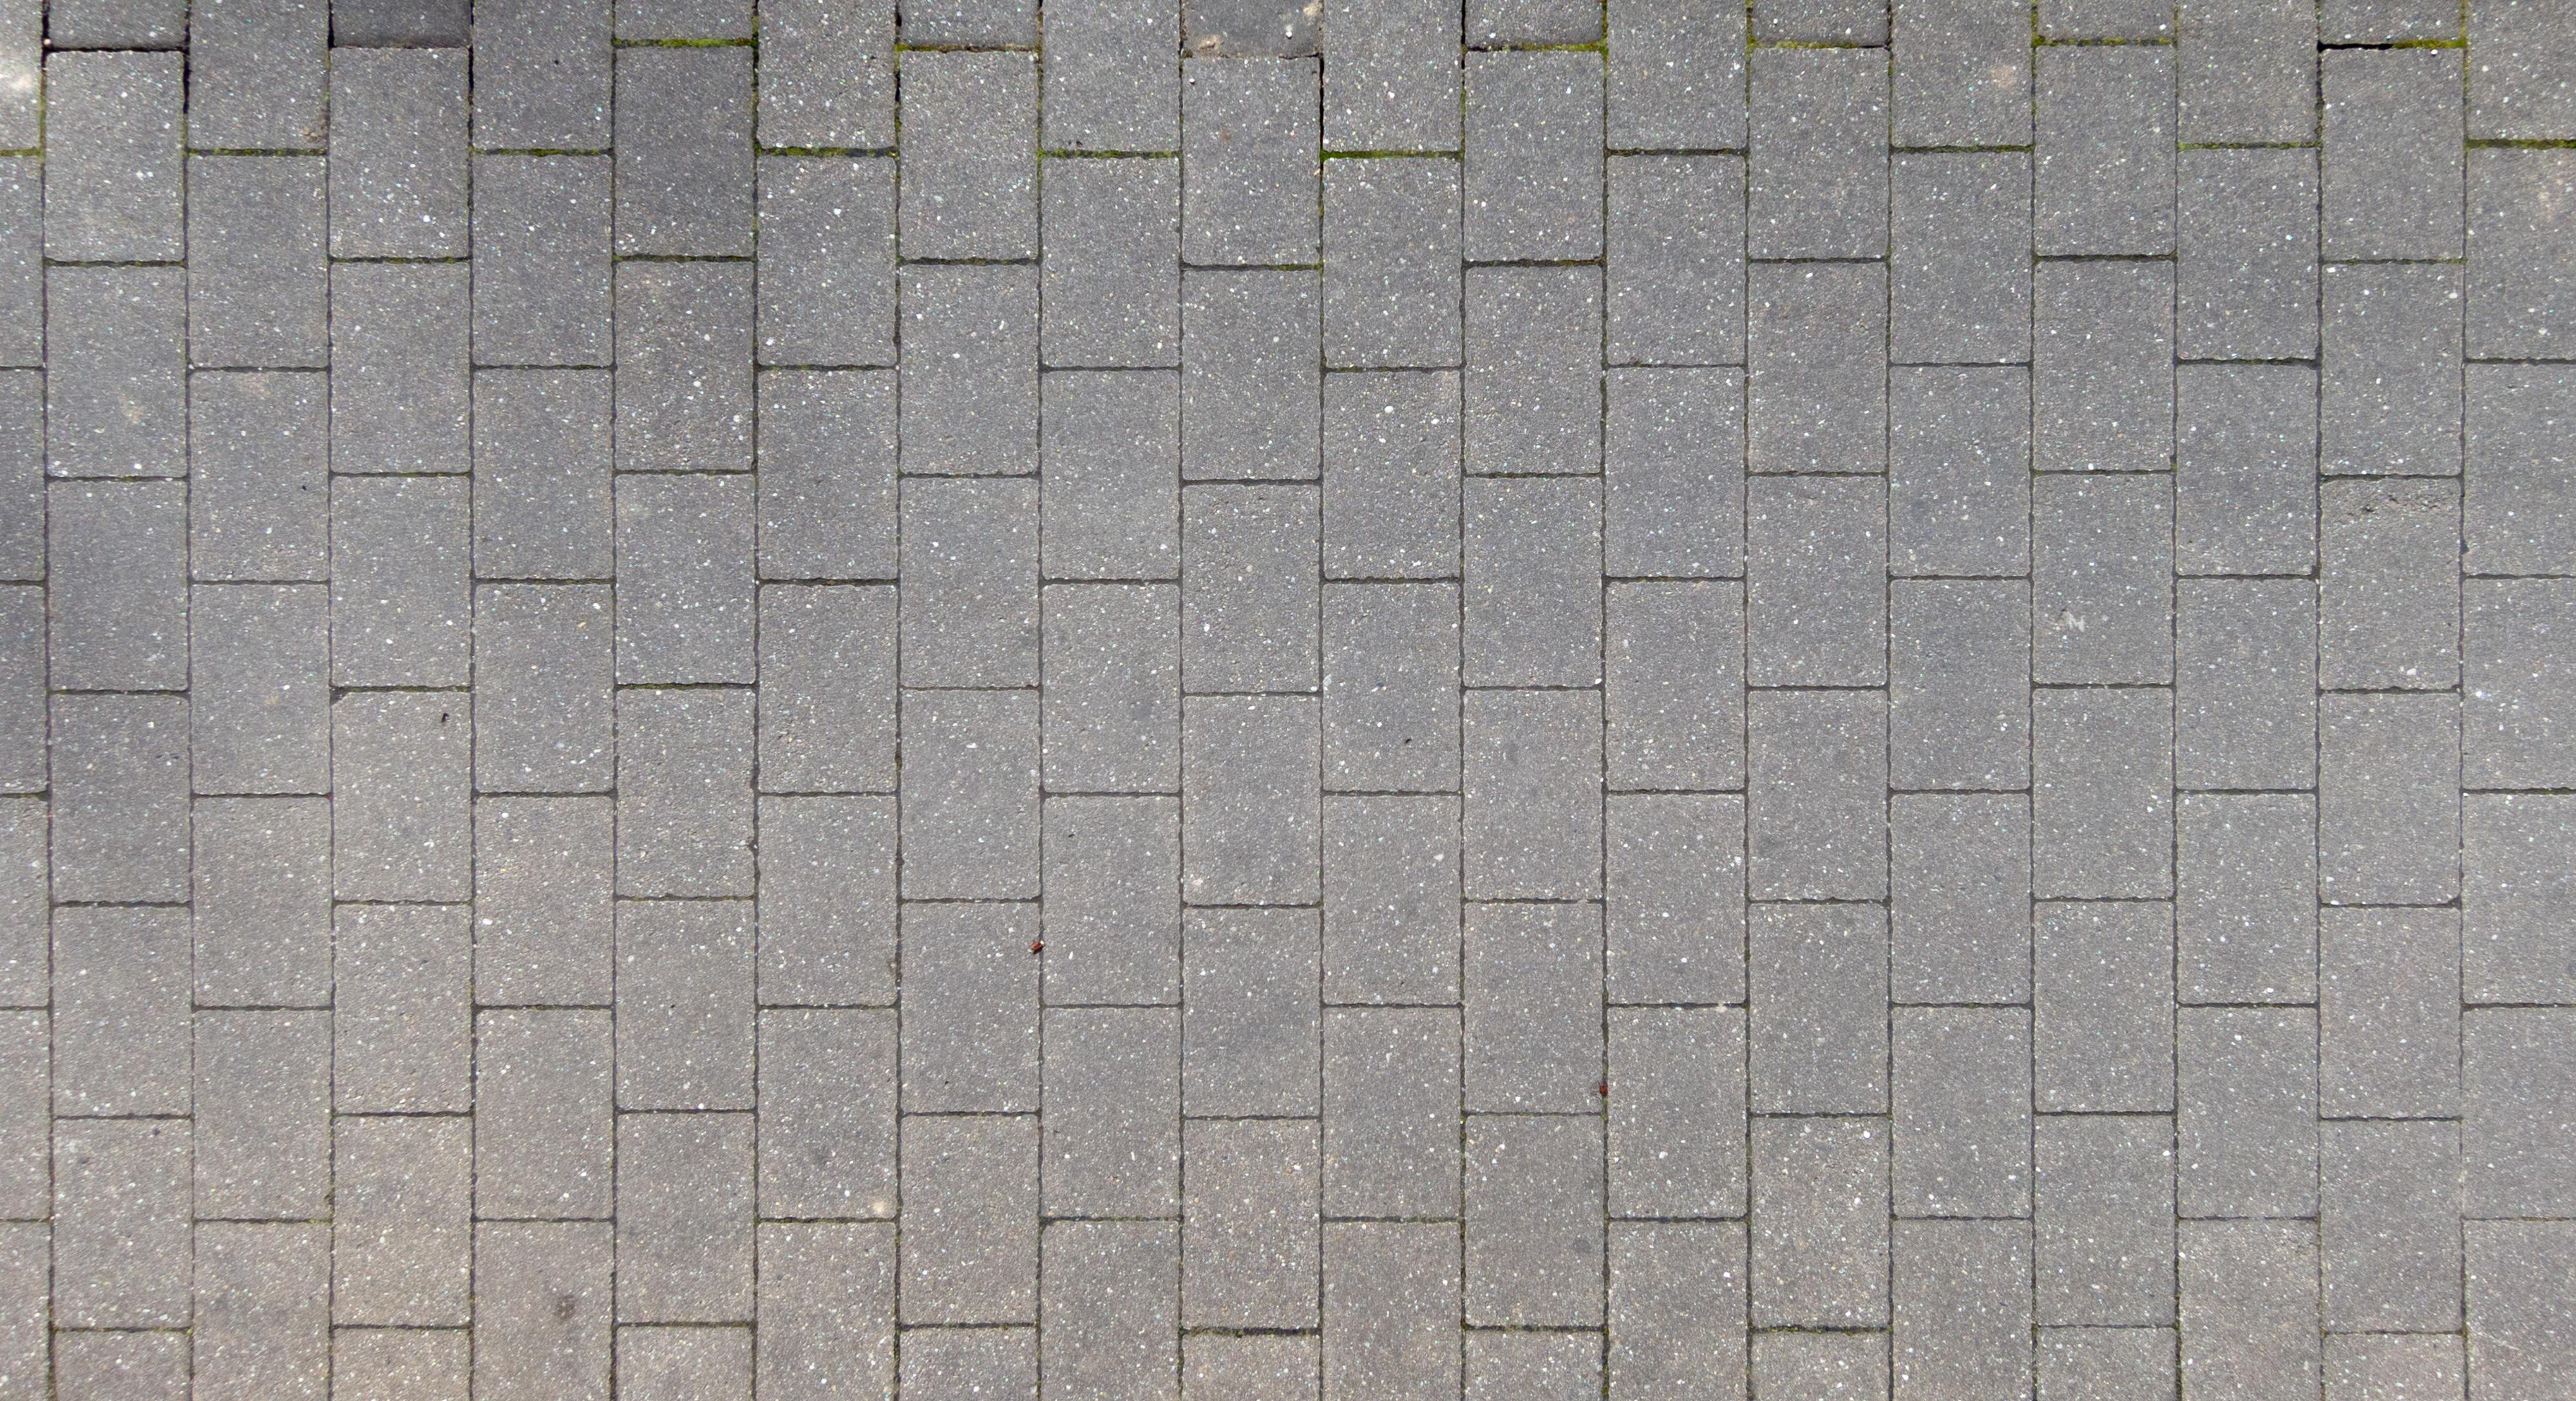 madera textura piso guijarro pared piedra pavimento patrn lnea azulejo pared de piedra ladrillo material superficie